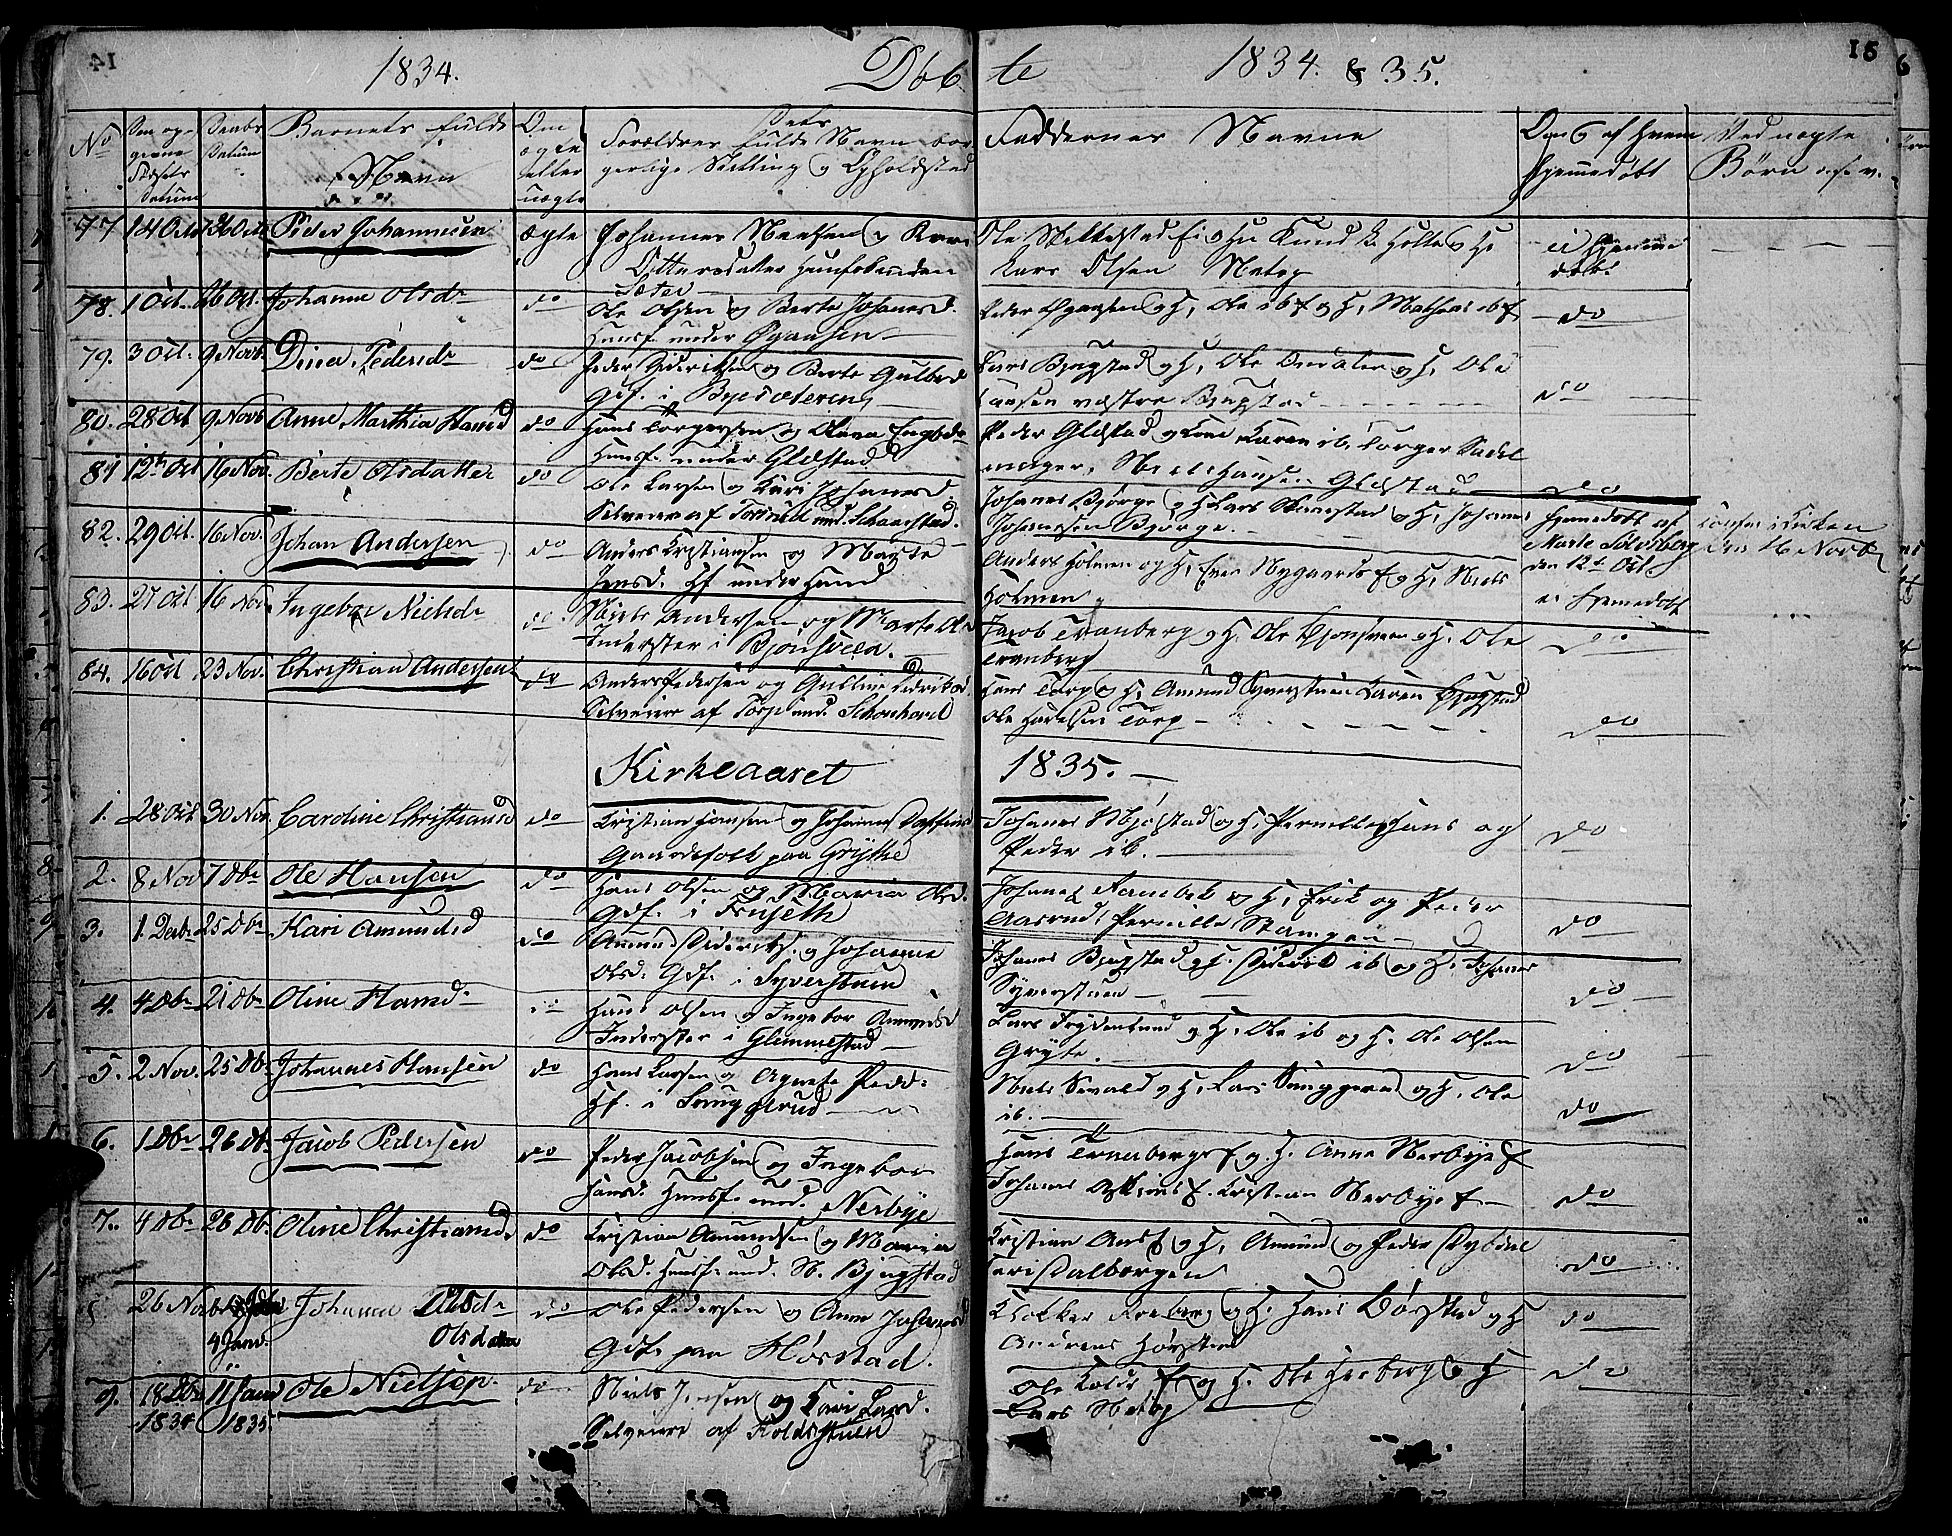 SAH, Vardal prestekontor, H/Ha/Hab/L0004: Klokkerbok nr. 4, 1831-1853, s. 15